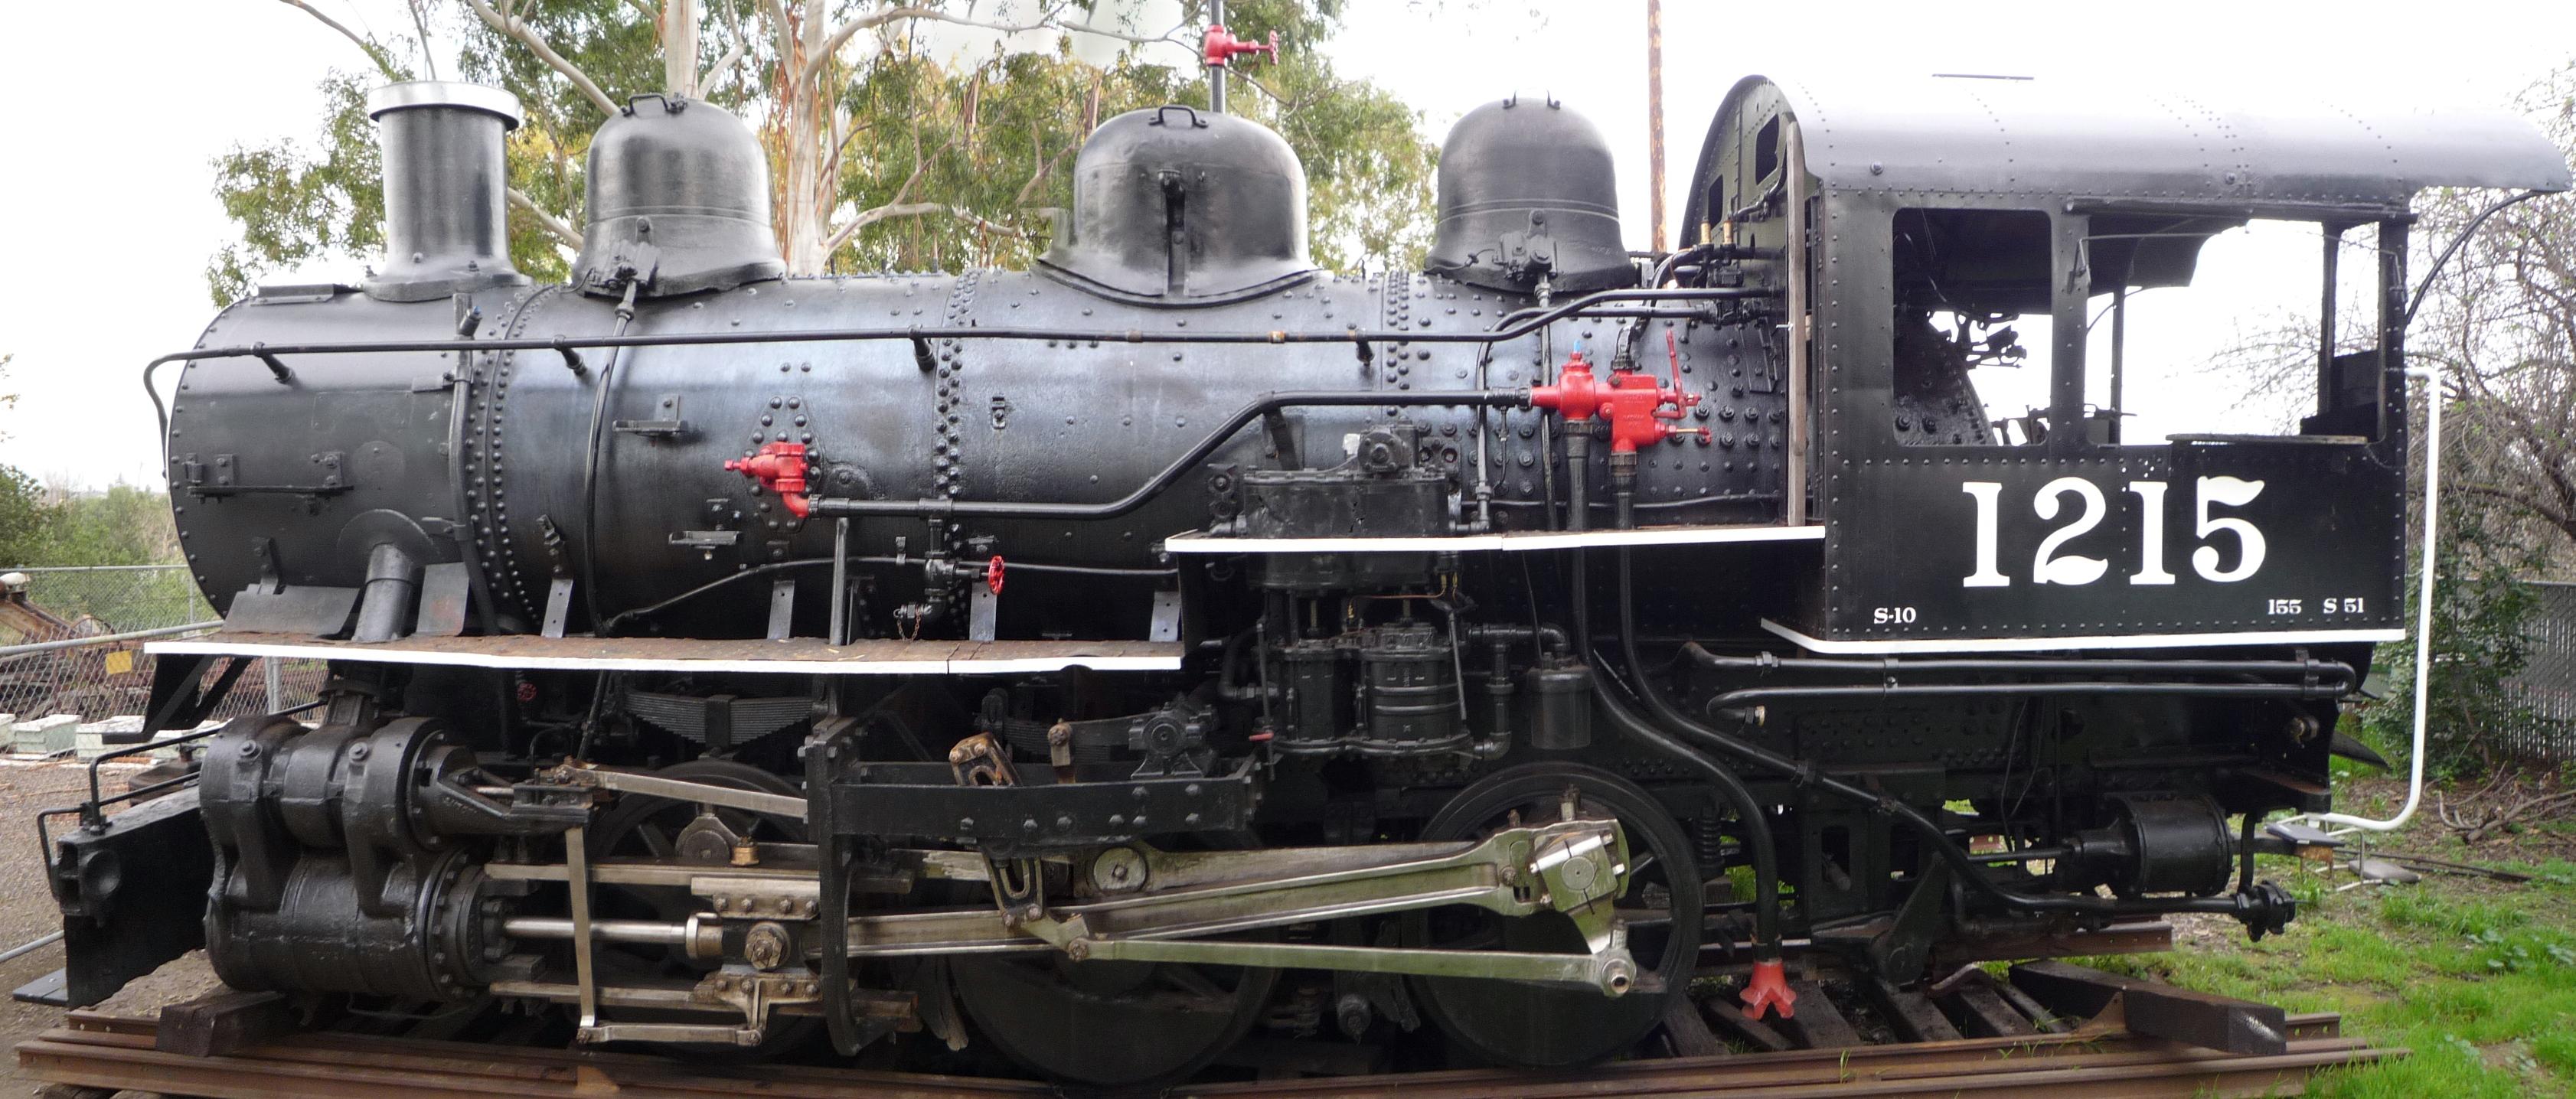 File:Southern Pacific Locomotive 1215.JPG